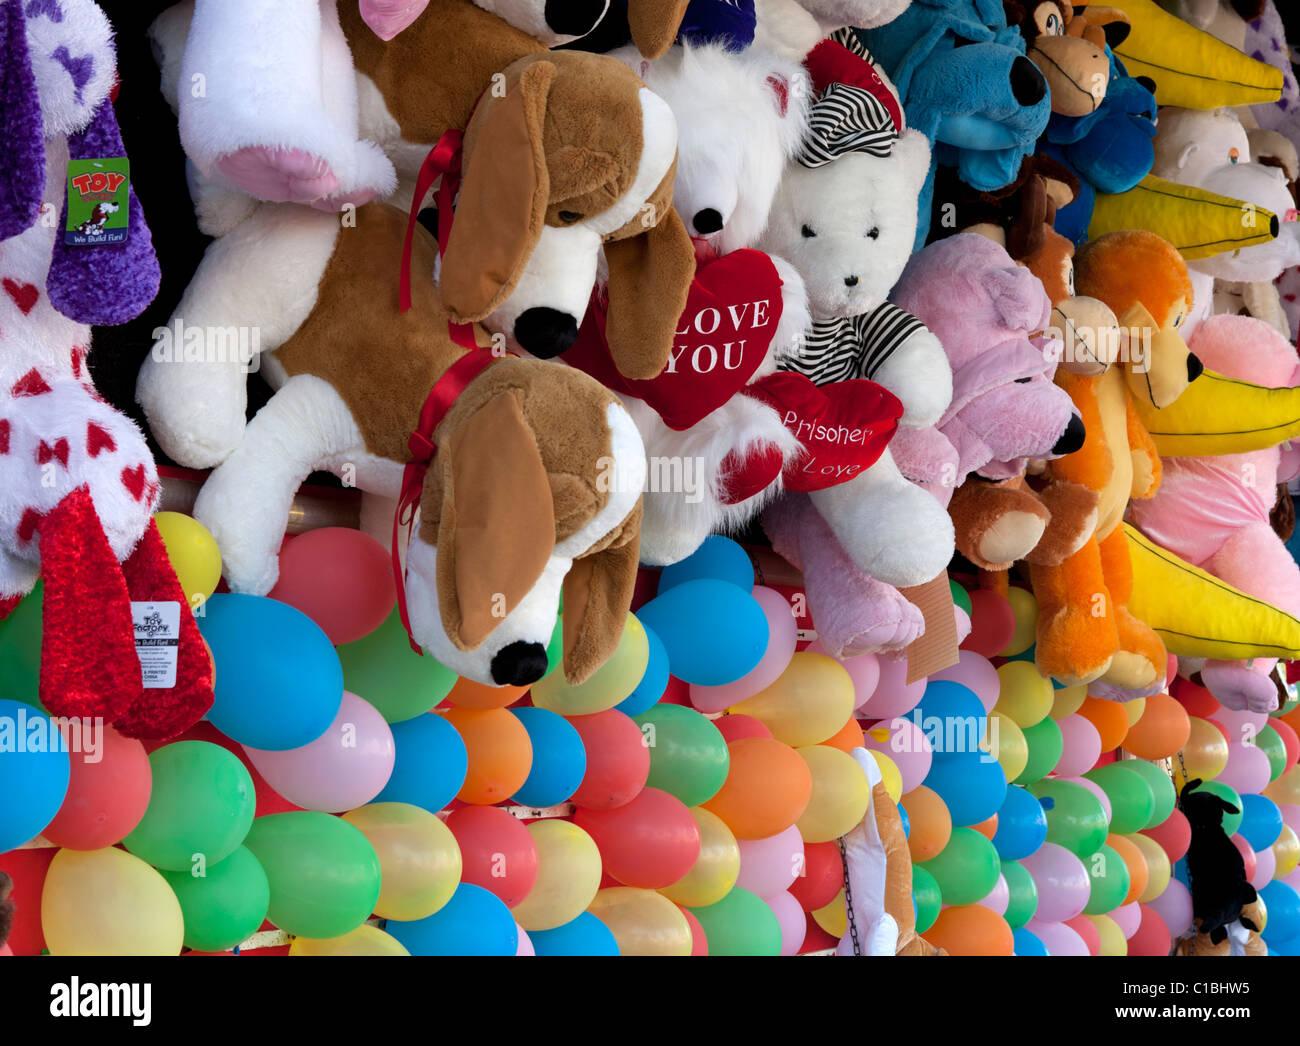 Fair prizes stuffed animals